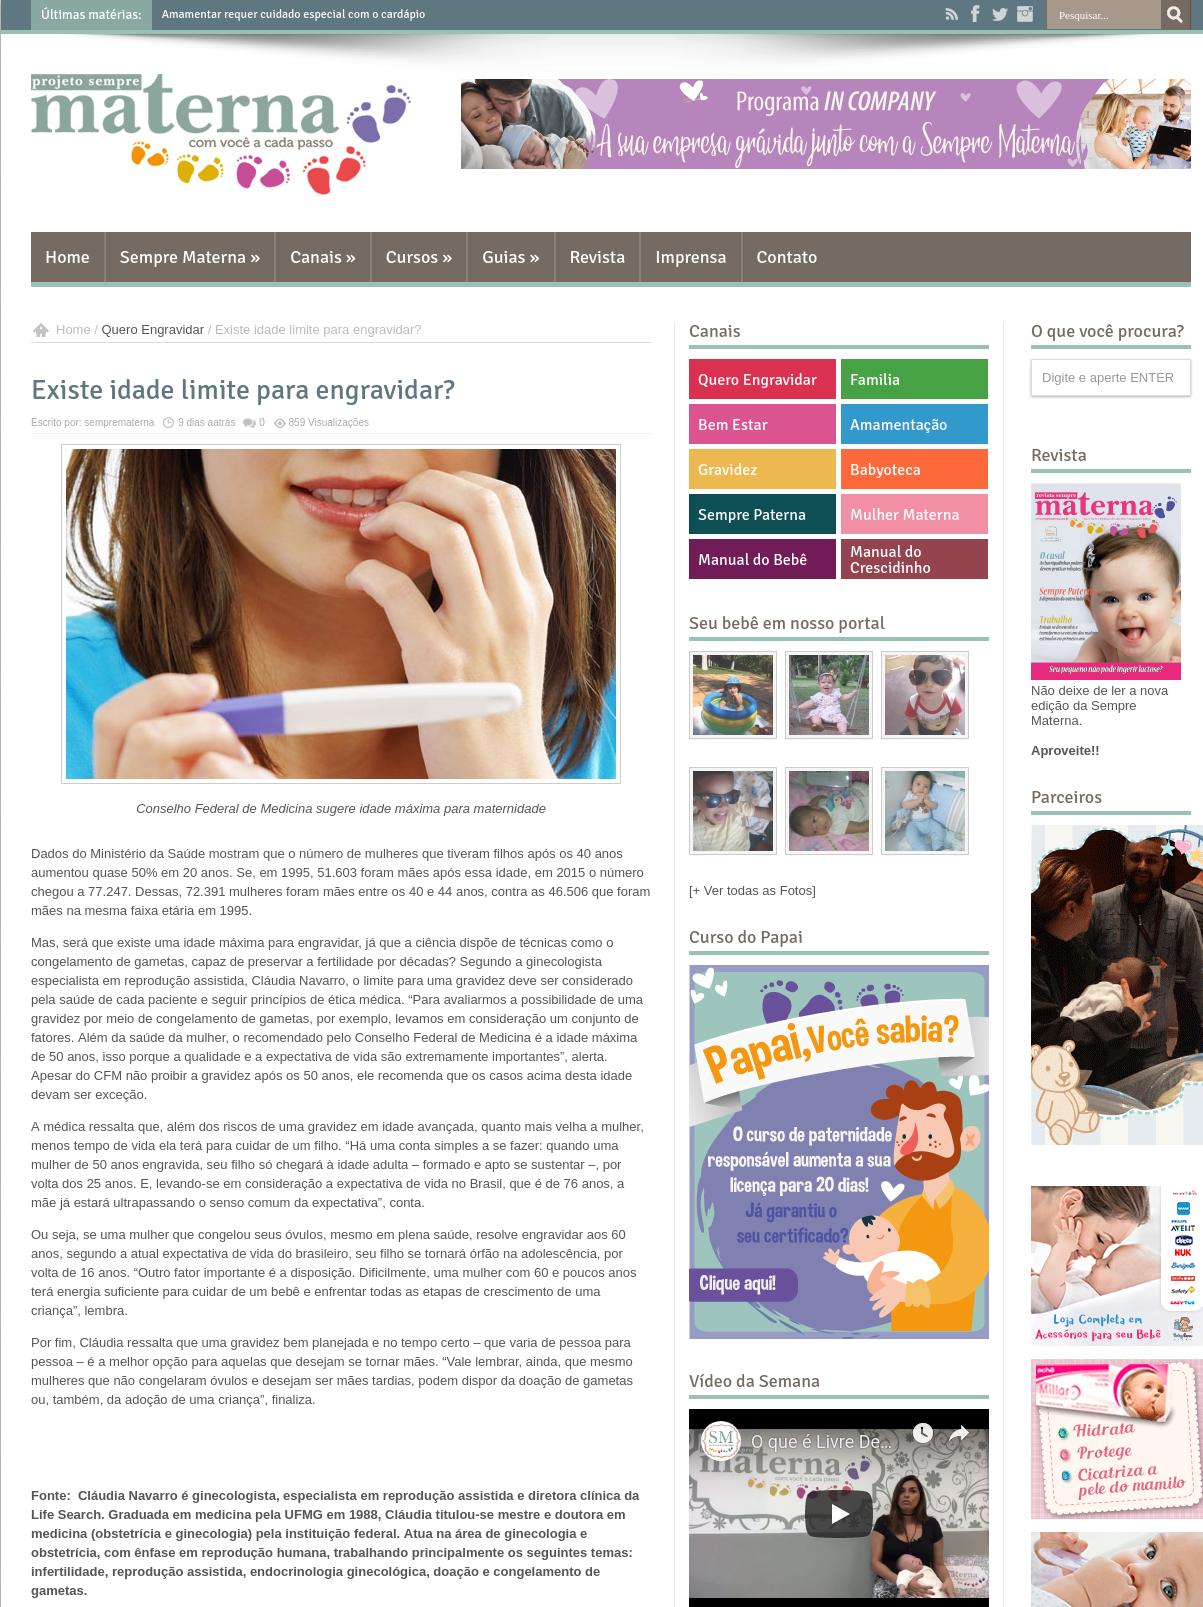 Revista Sempre Materna – Existe idade limite para engravidar?